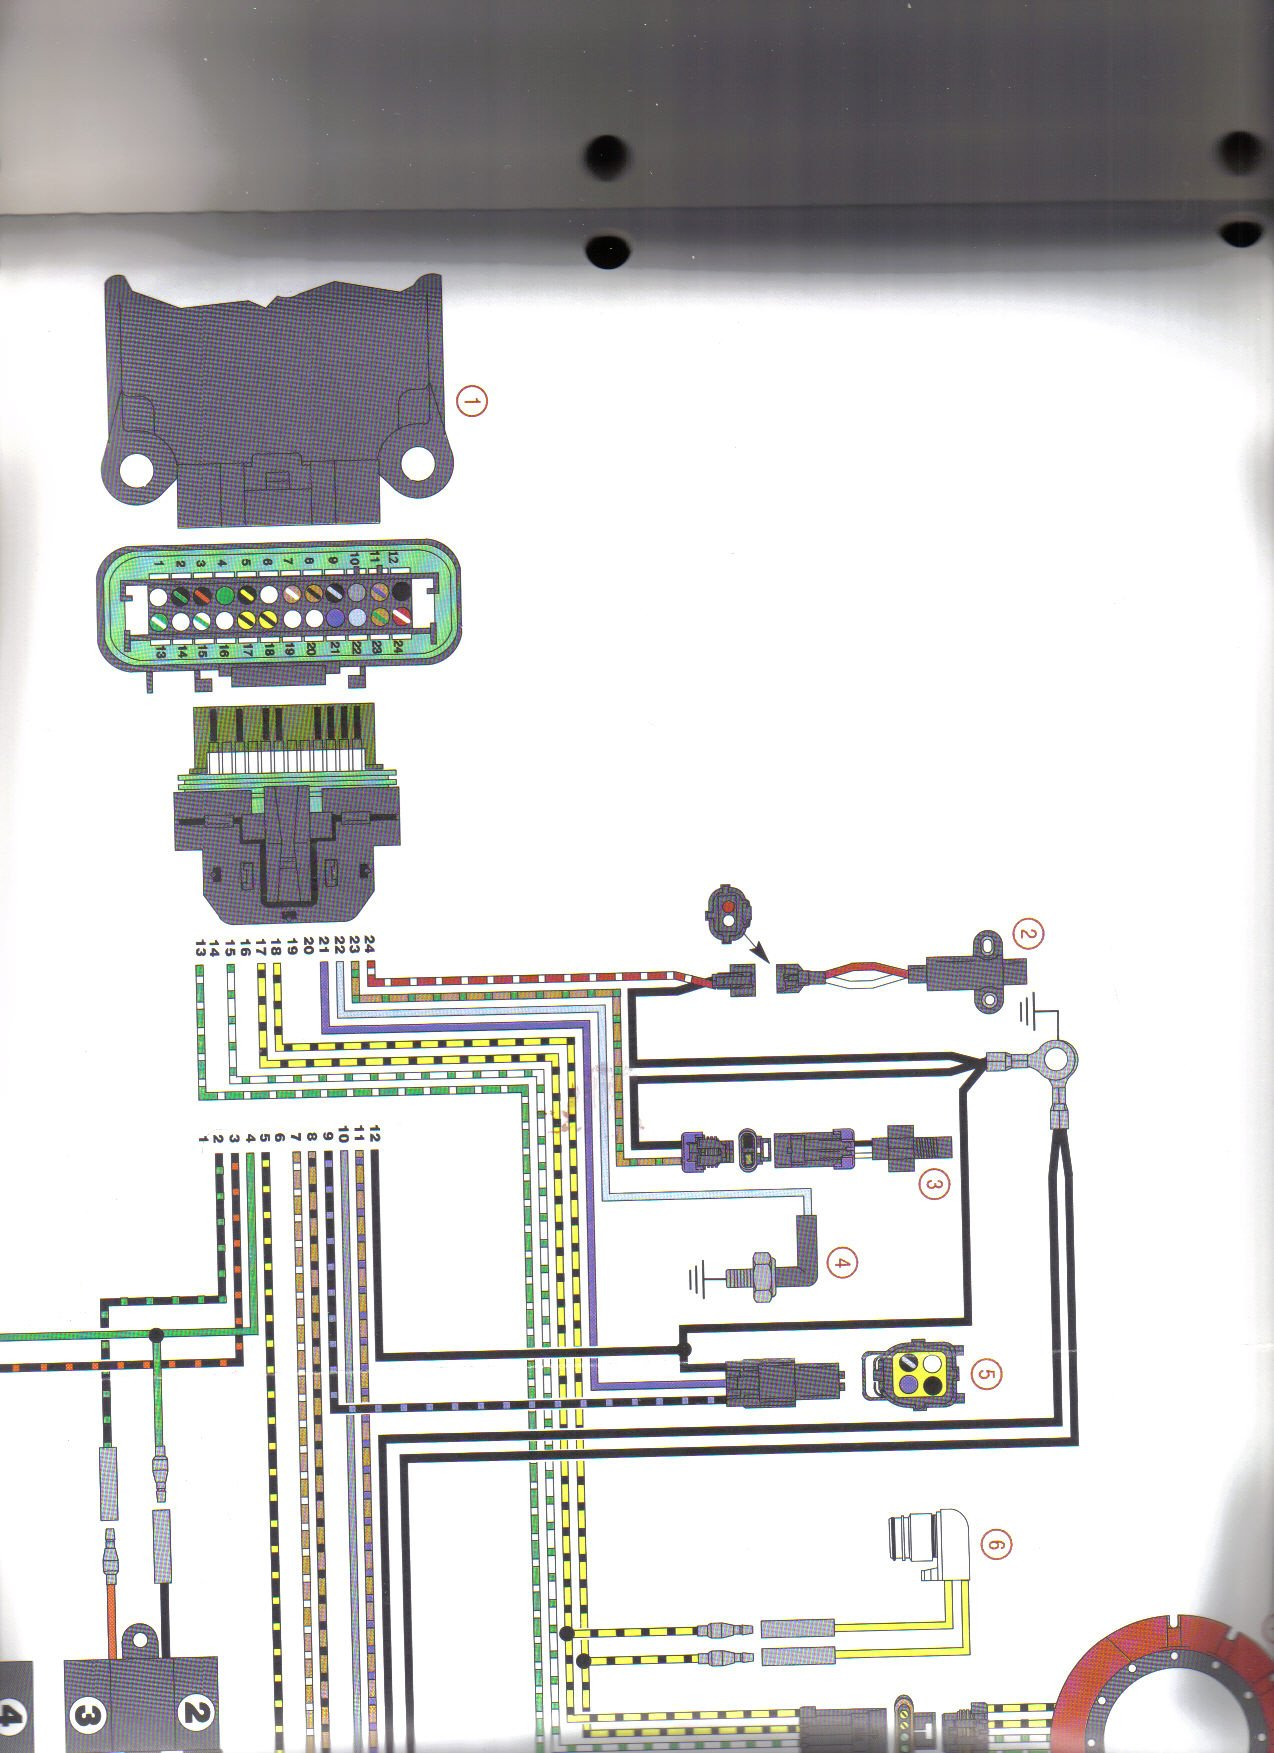 Mercury Bigfoot 60 Wiring Diagram Start Building A Hp Manual Rh Apnmata Org Parts 2